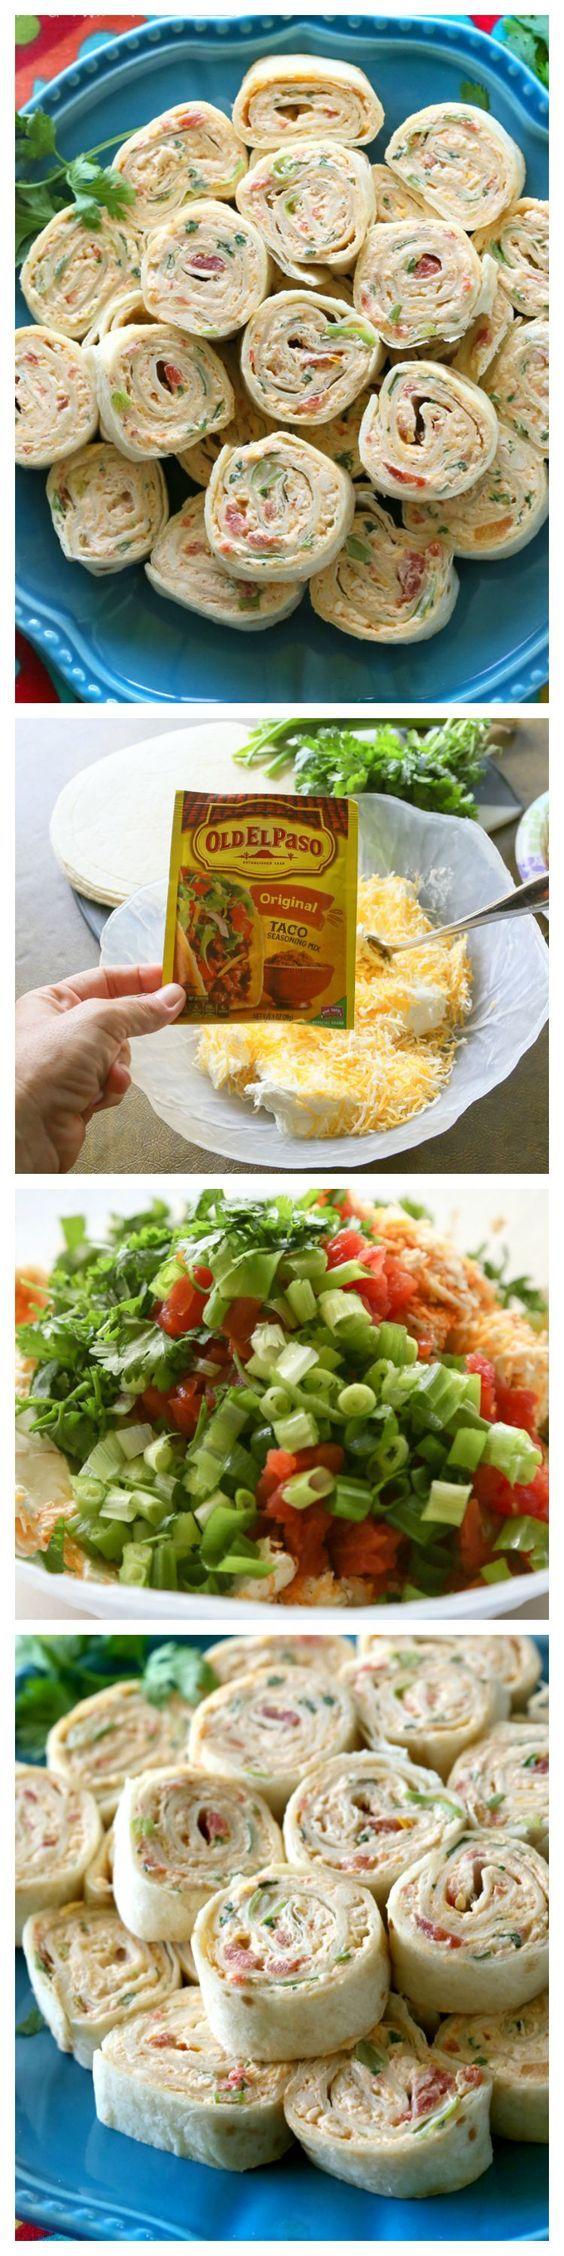 Chicken Enchilada Roll Ups                                                                                                                                                                                 More